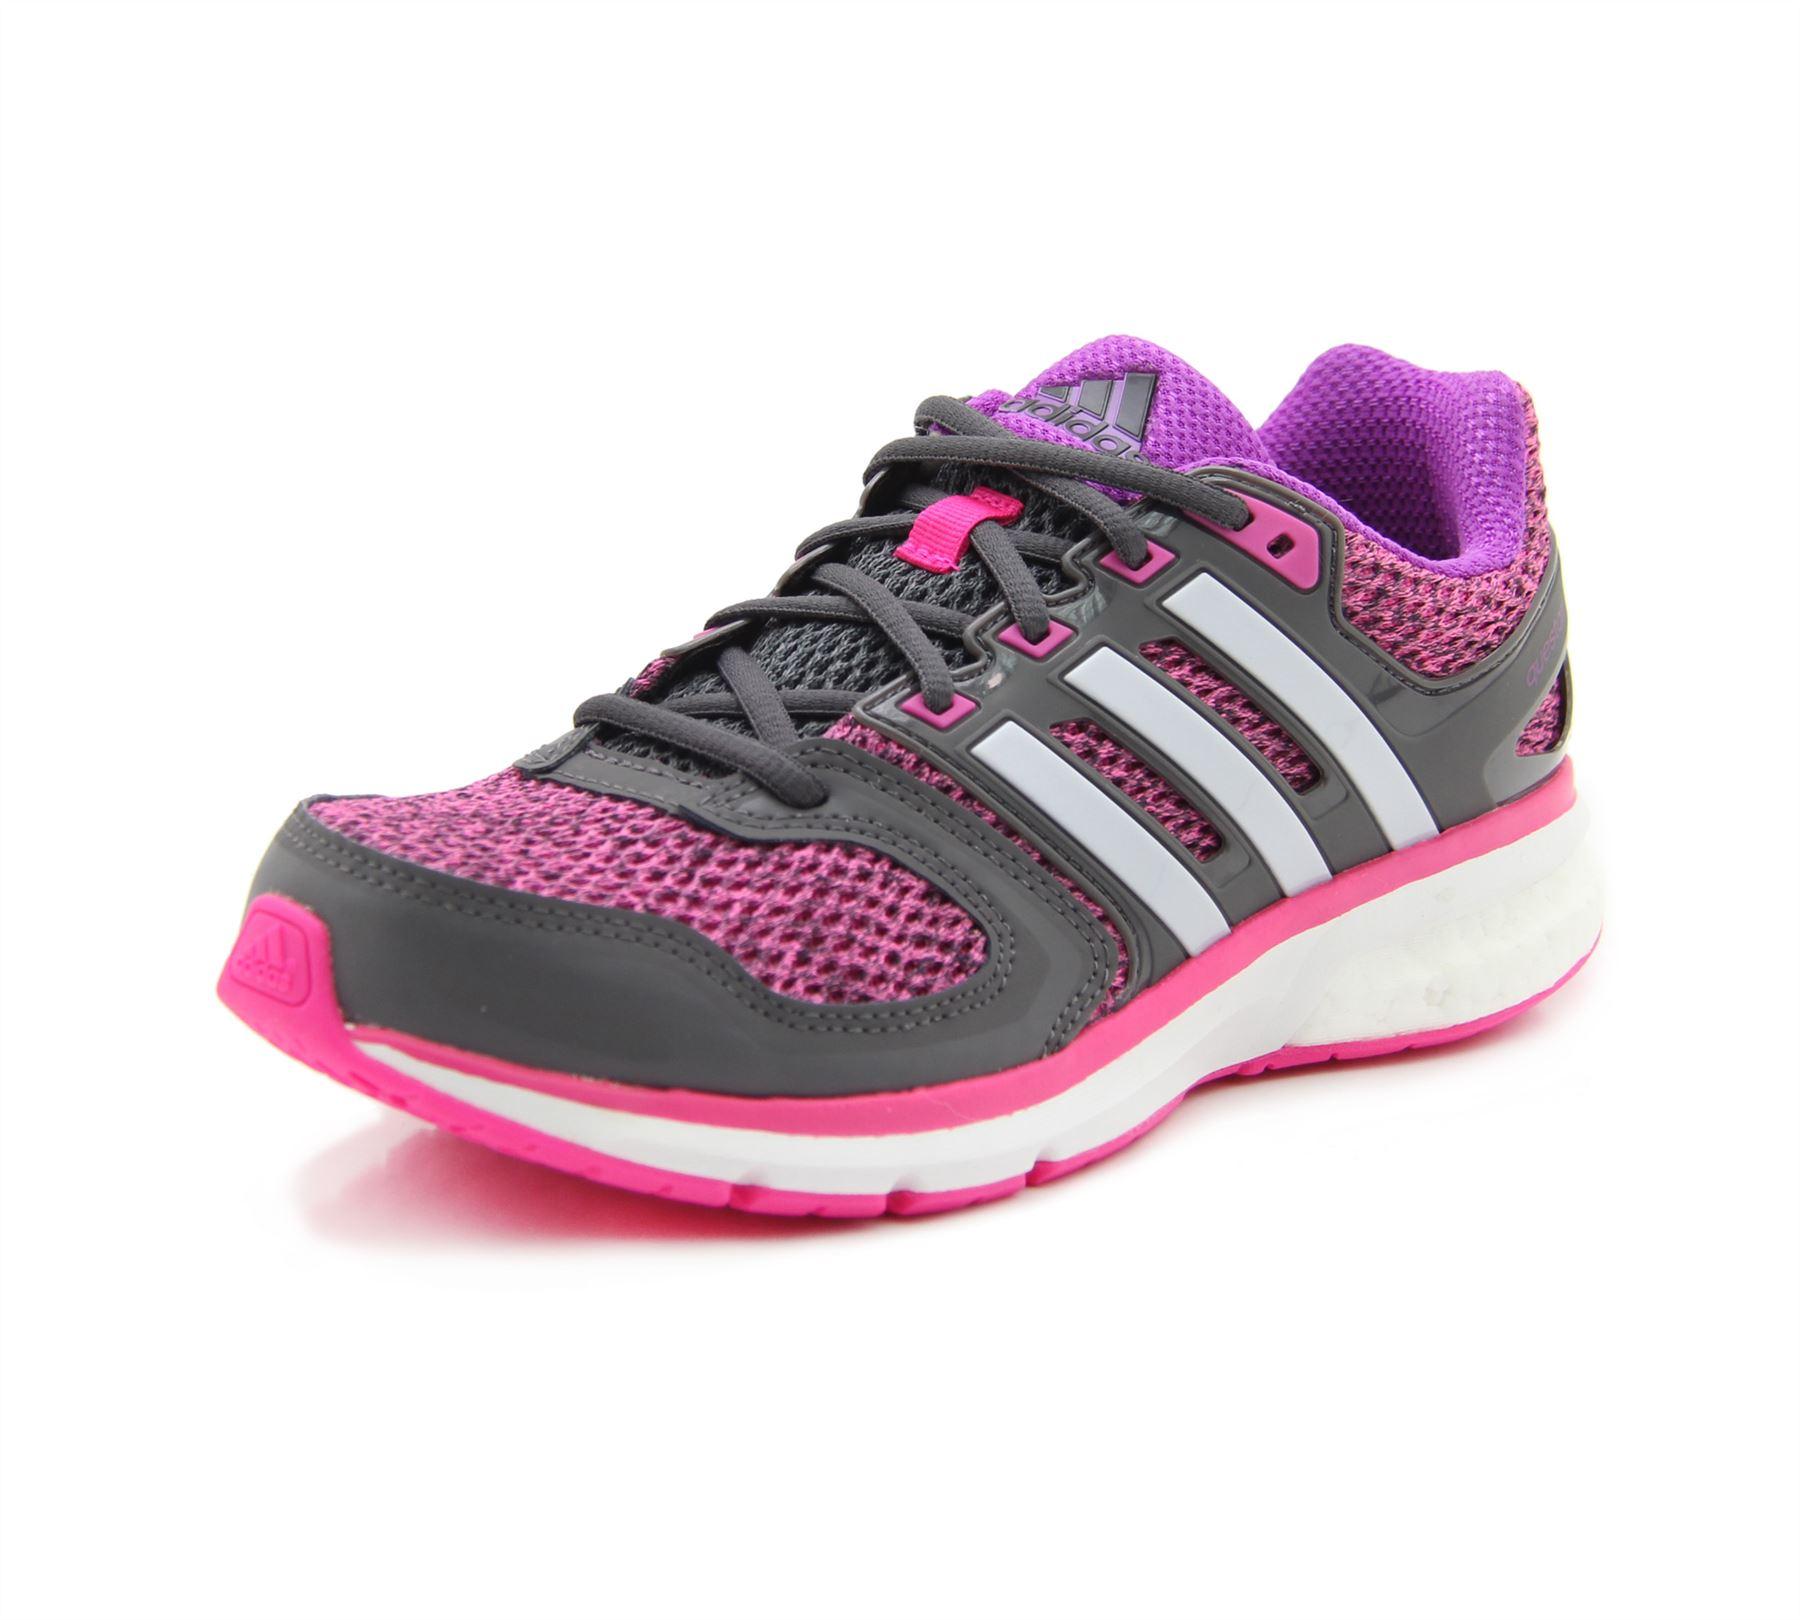 c9501b27b ... adidas Questar Boost Running Shoes Womens Pink Grey Purple Fitness  Trainers ...